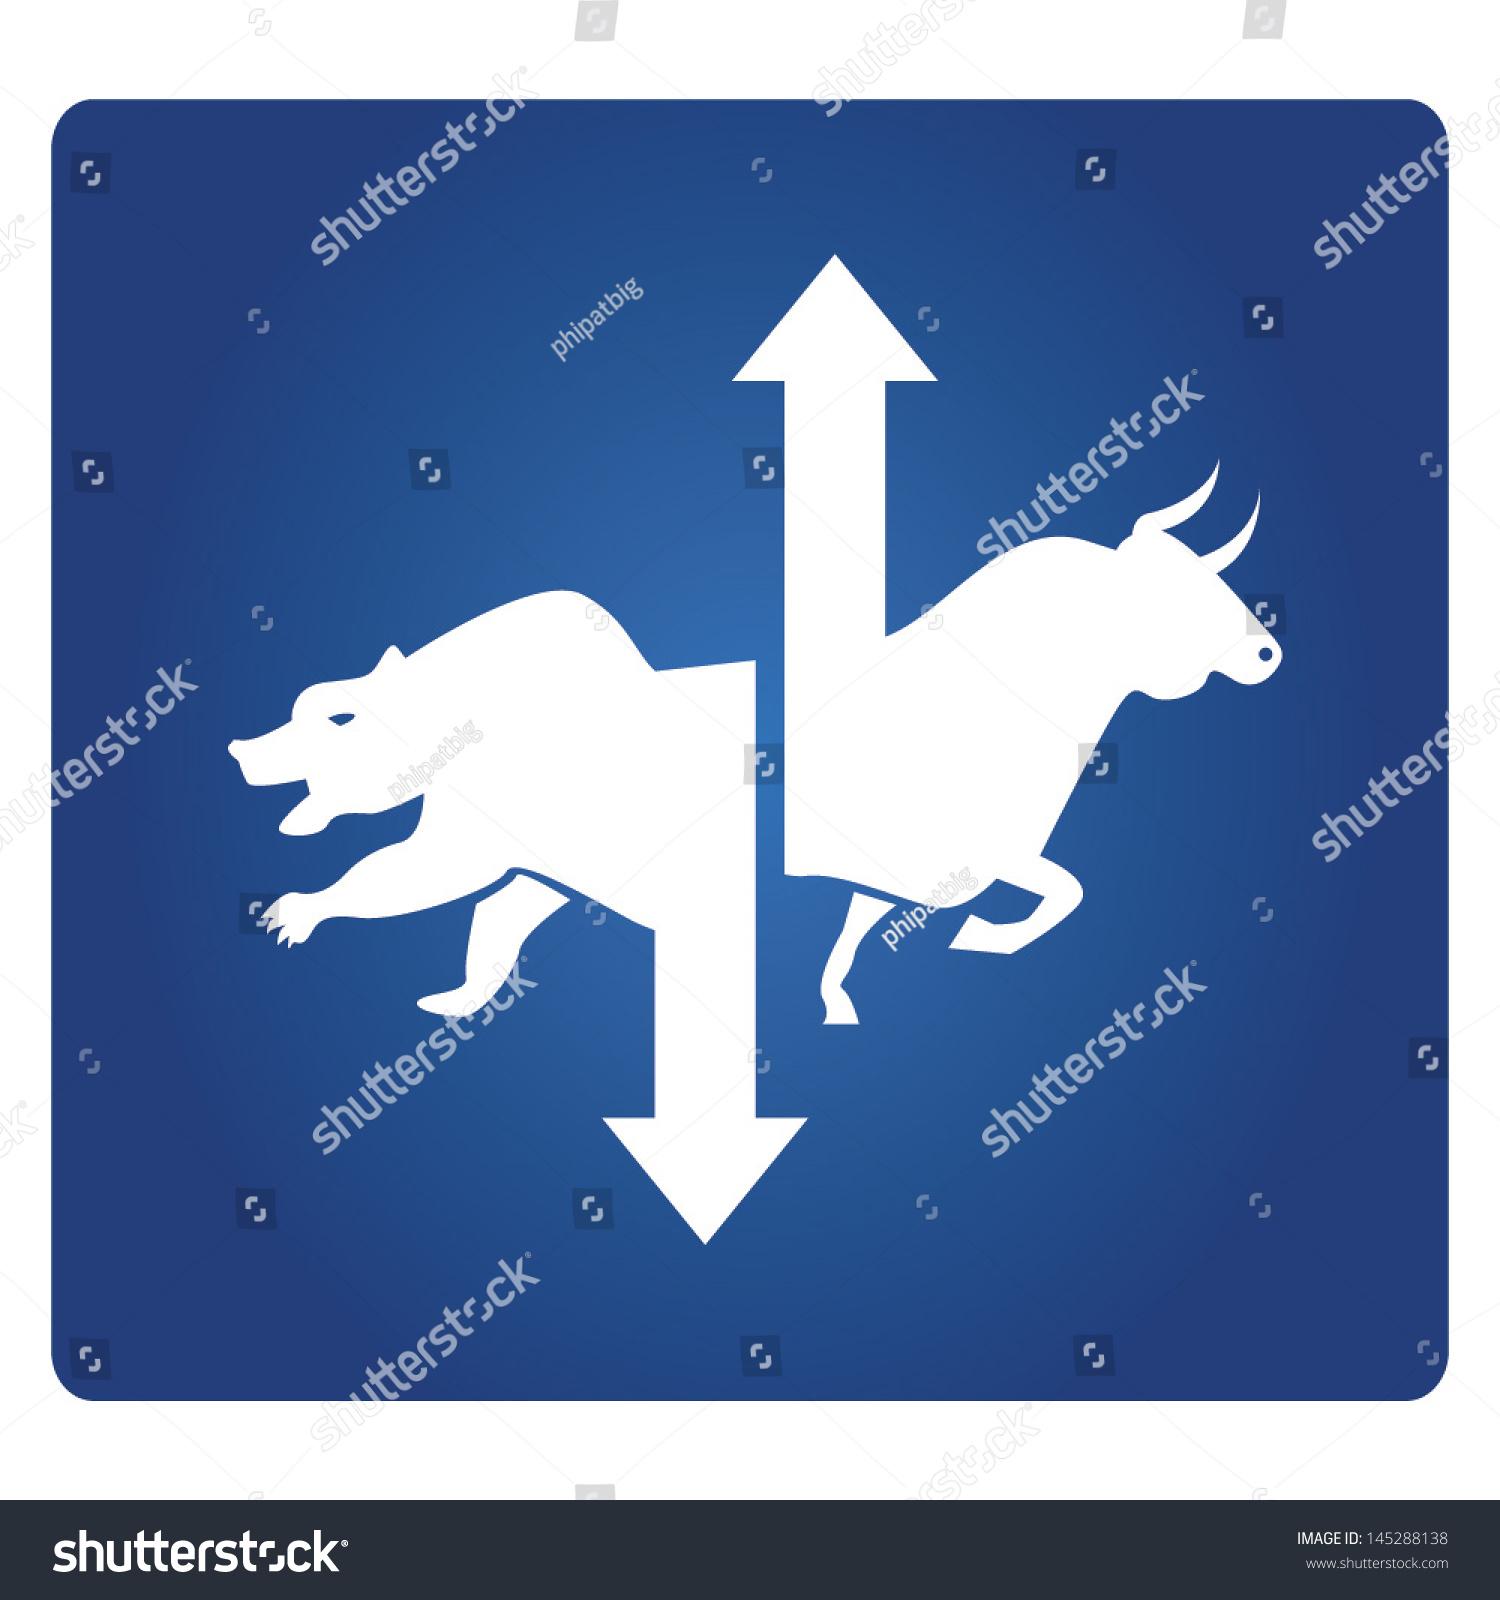 Stock Market Symbol Stock Vector Royalty Free 145288138 Shutterstock